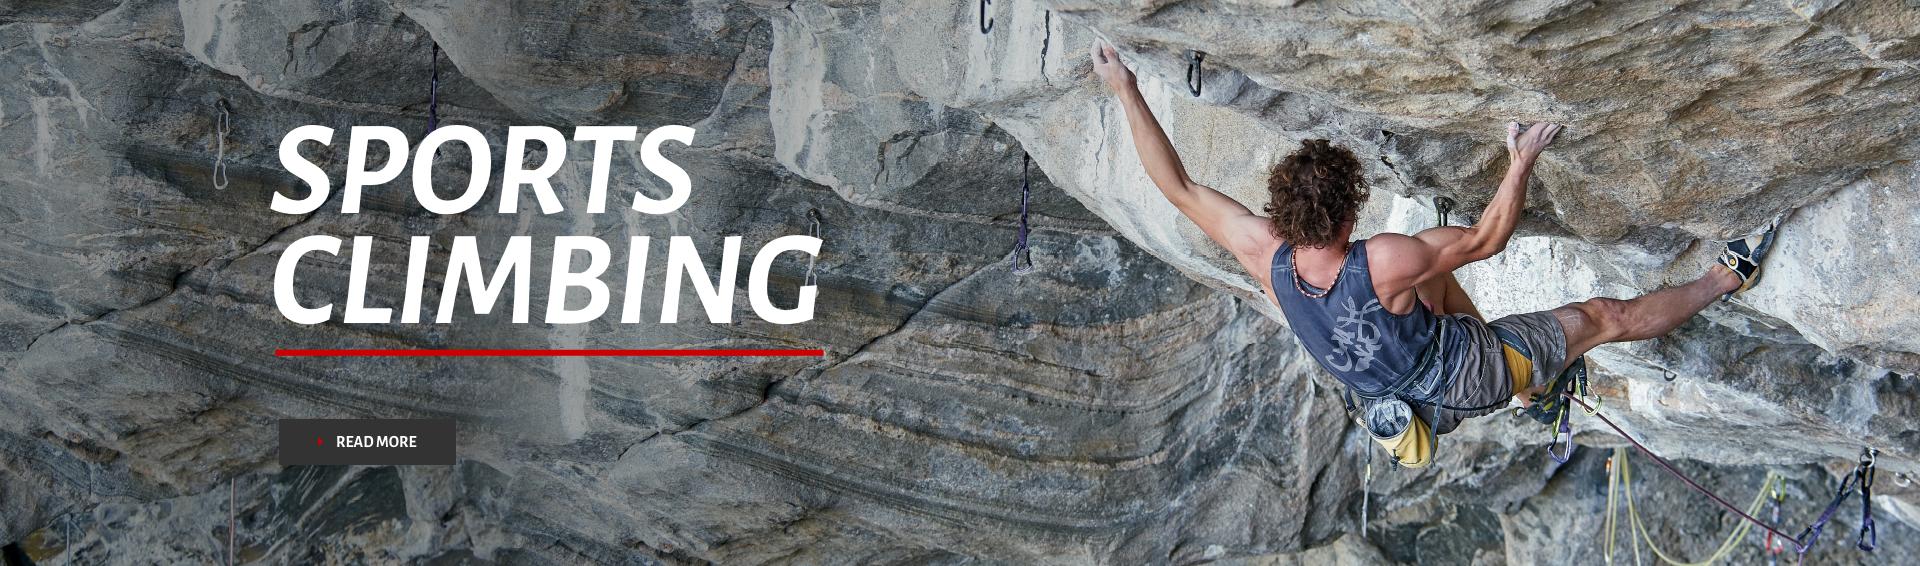 /top_sportsclimbing_pc.jpg